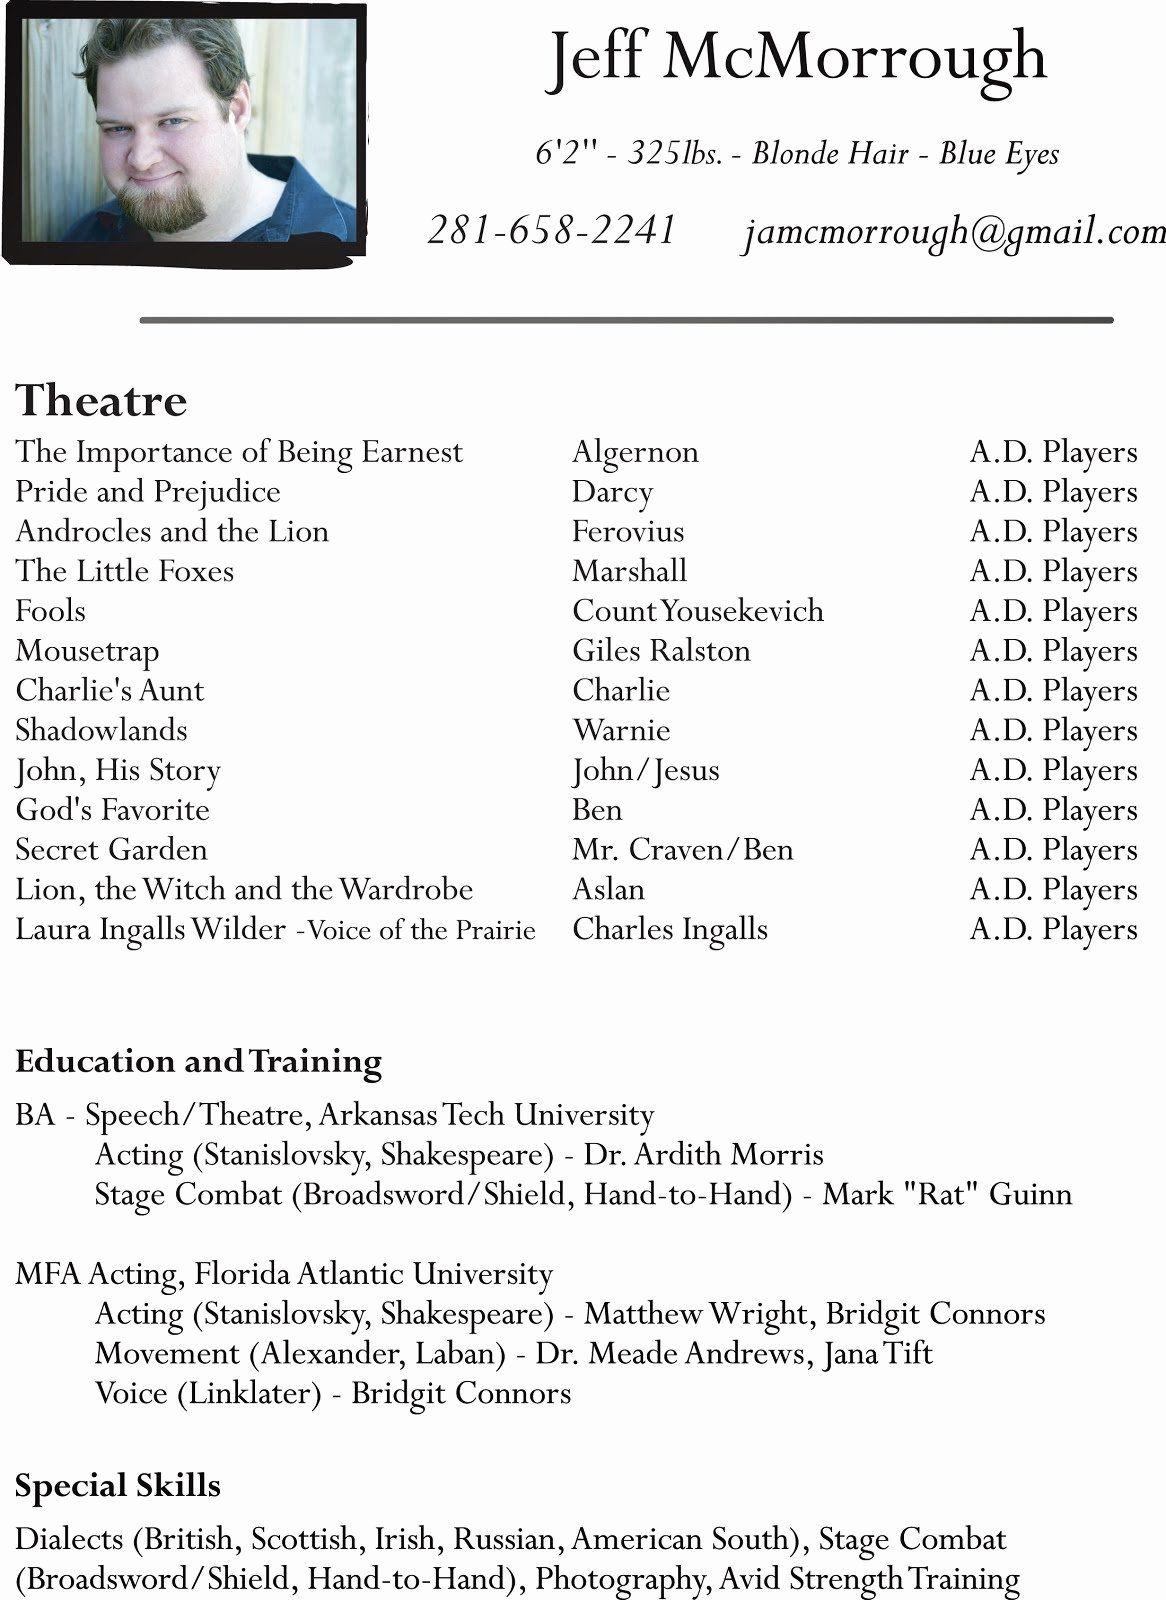 Beginner Actor Resume Template Beautiful Talent Star Acting Resume Actor Beginner Kids Theatre Resume Design Template Resume Template Acting Resume Template